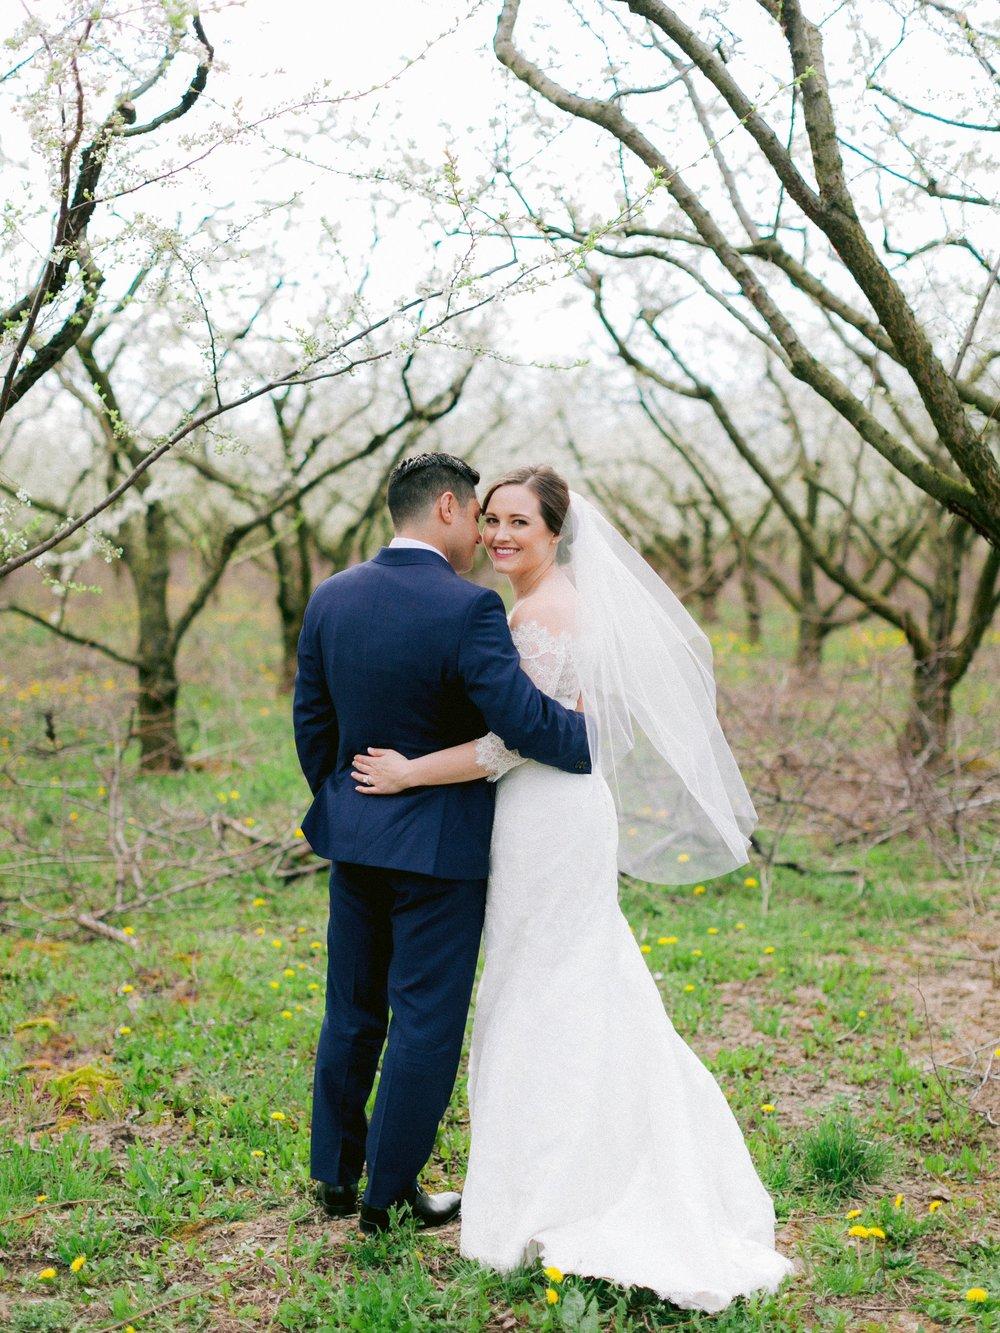 Niagara_on_the_lake_spring_wedding_kurtz_orpia_toronto_Vineyard_wedding_fine_art (59 of 92).jpg